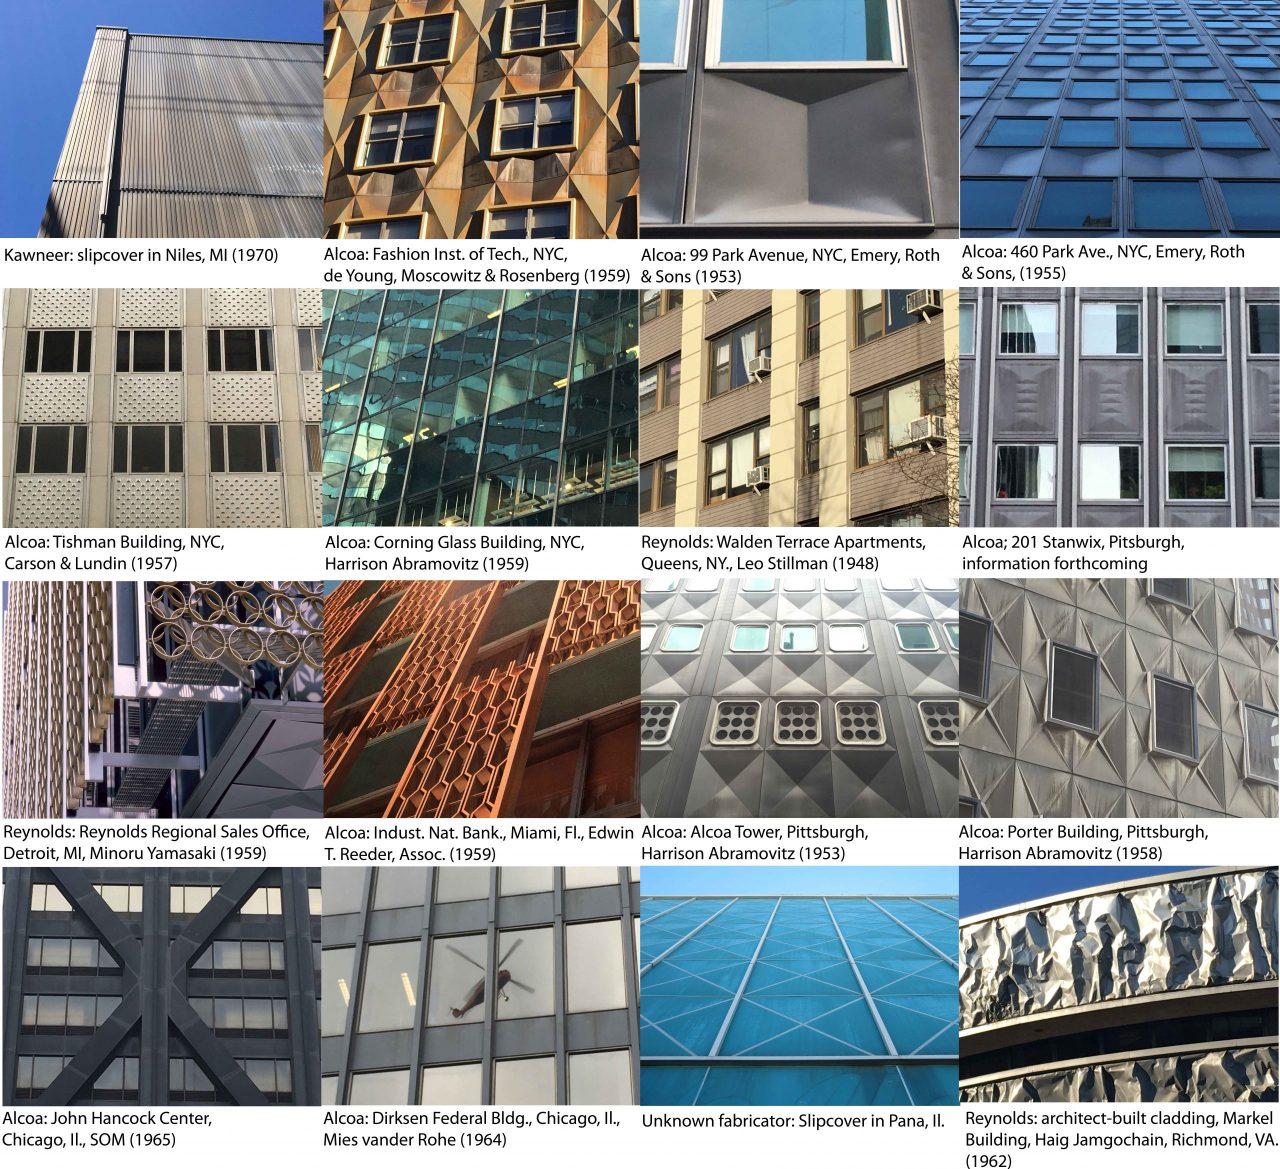 Grid of images of aluminum cladding